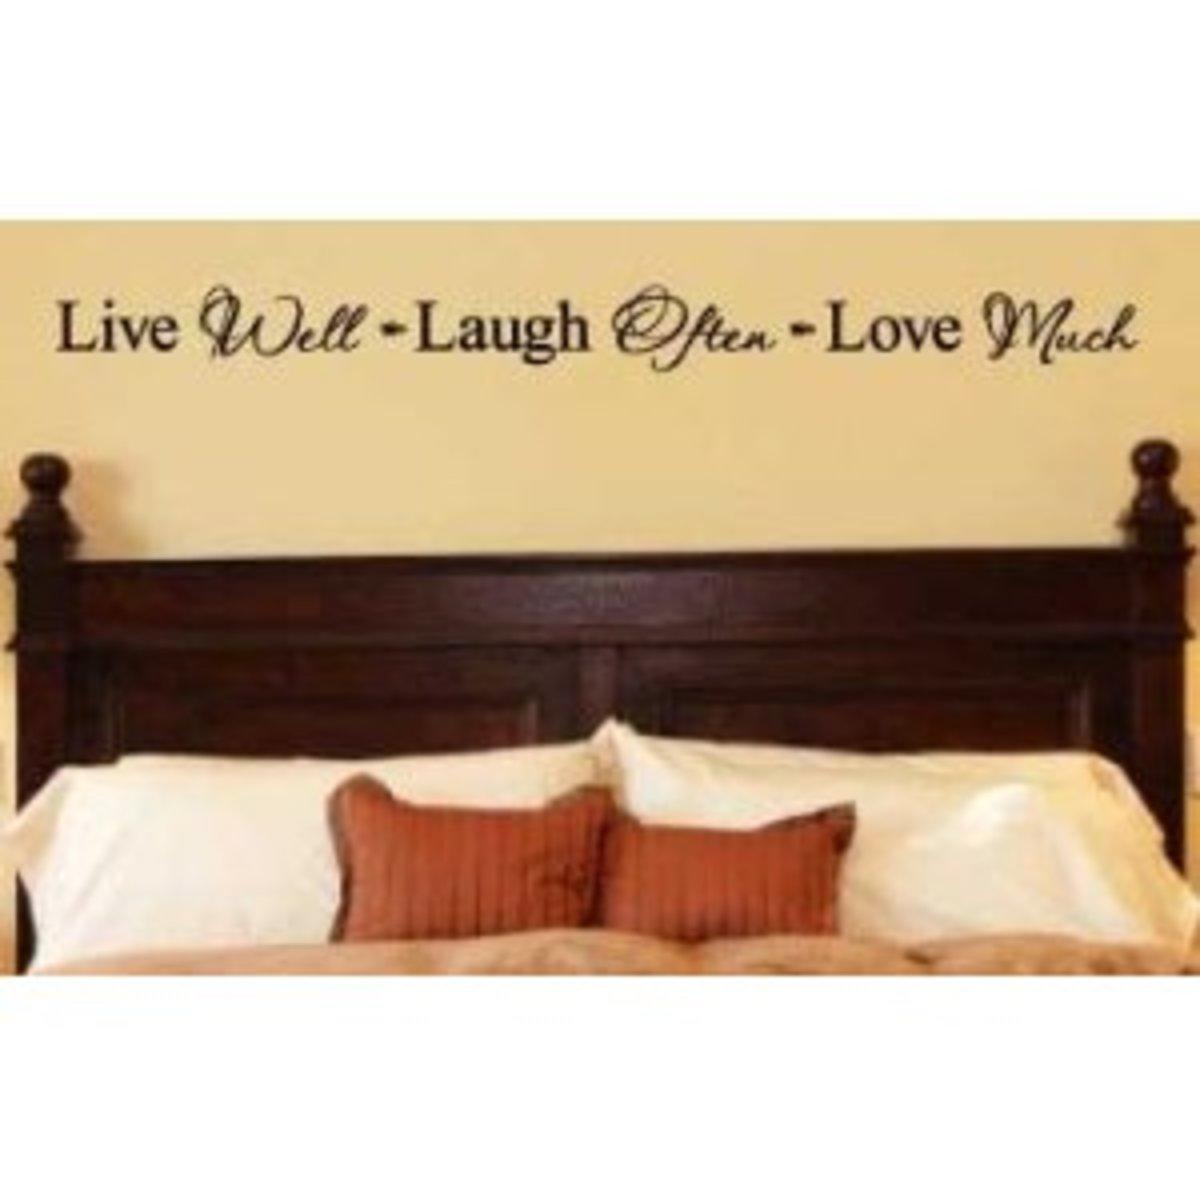 Live Laugh Love Origin